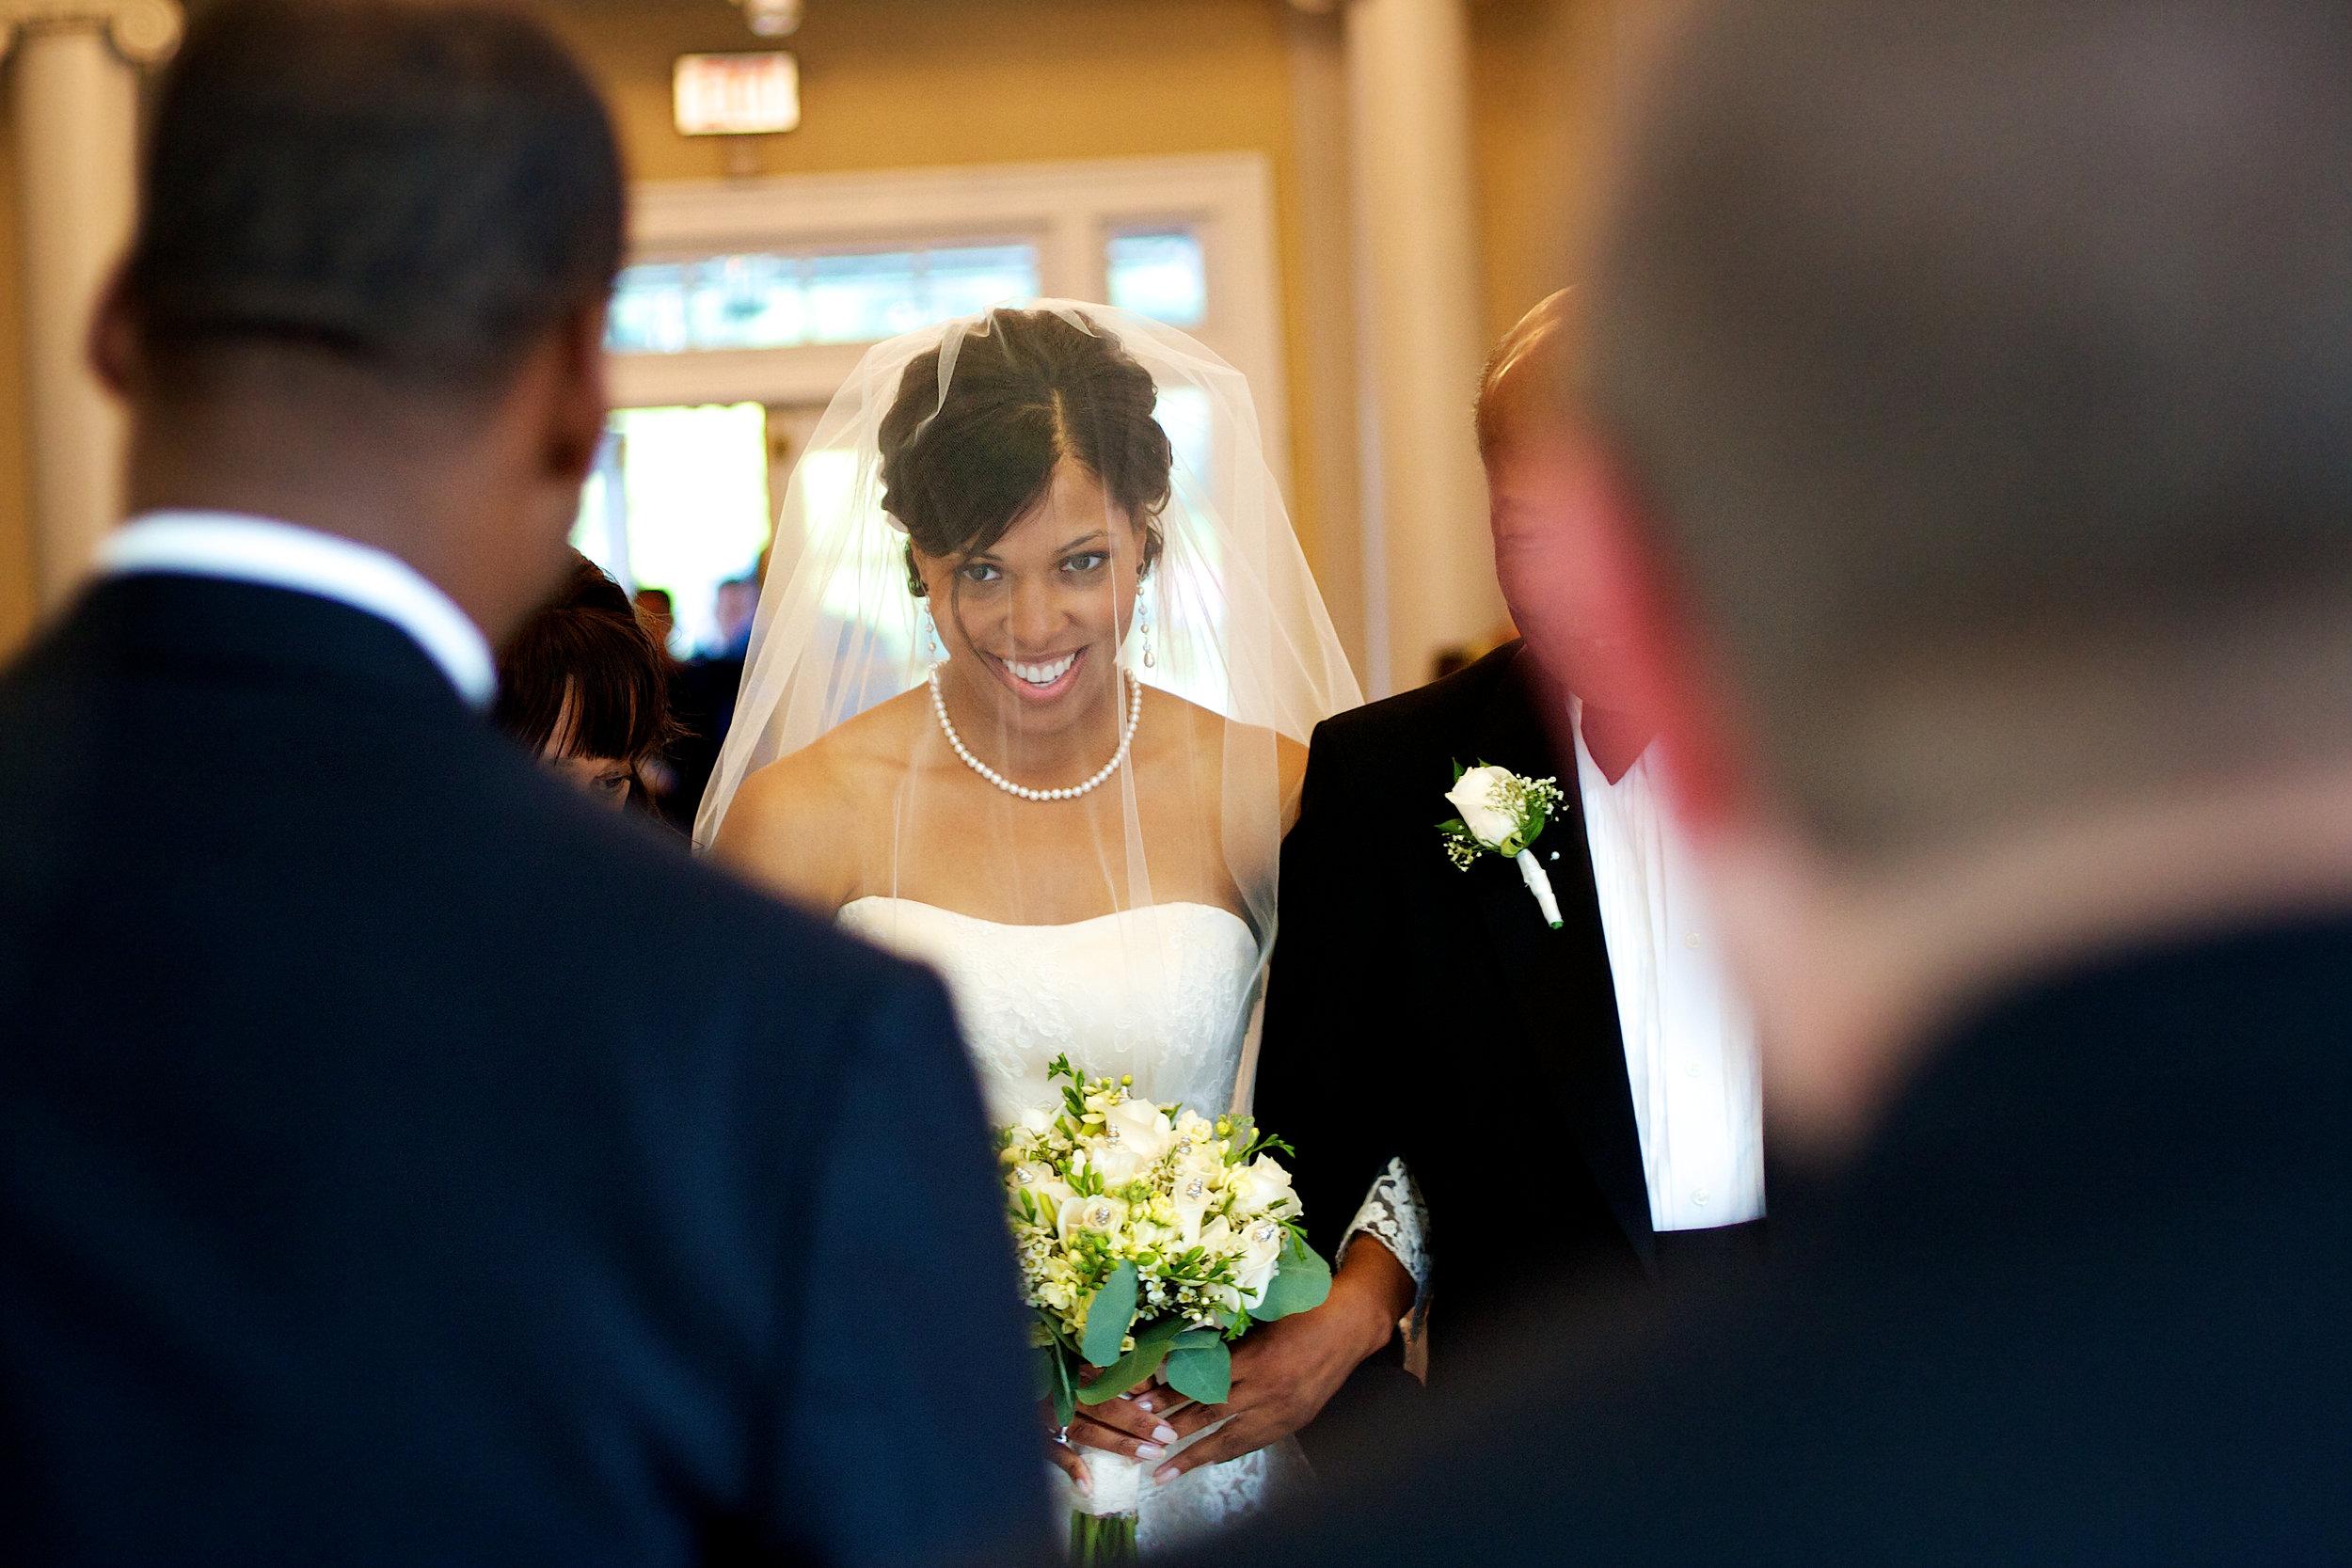 Sharla & Dwayne Sterling Wedding - Ceremony - by StanChambersJr Photography 045.jpg